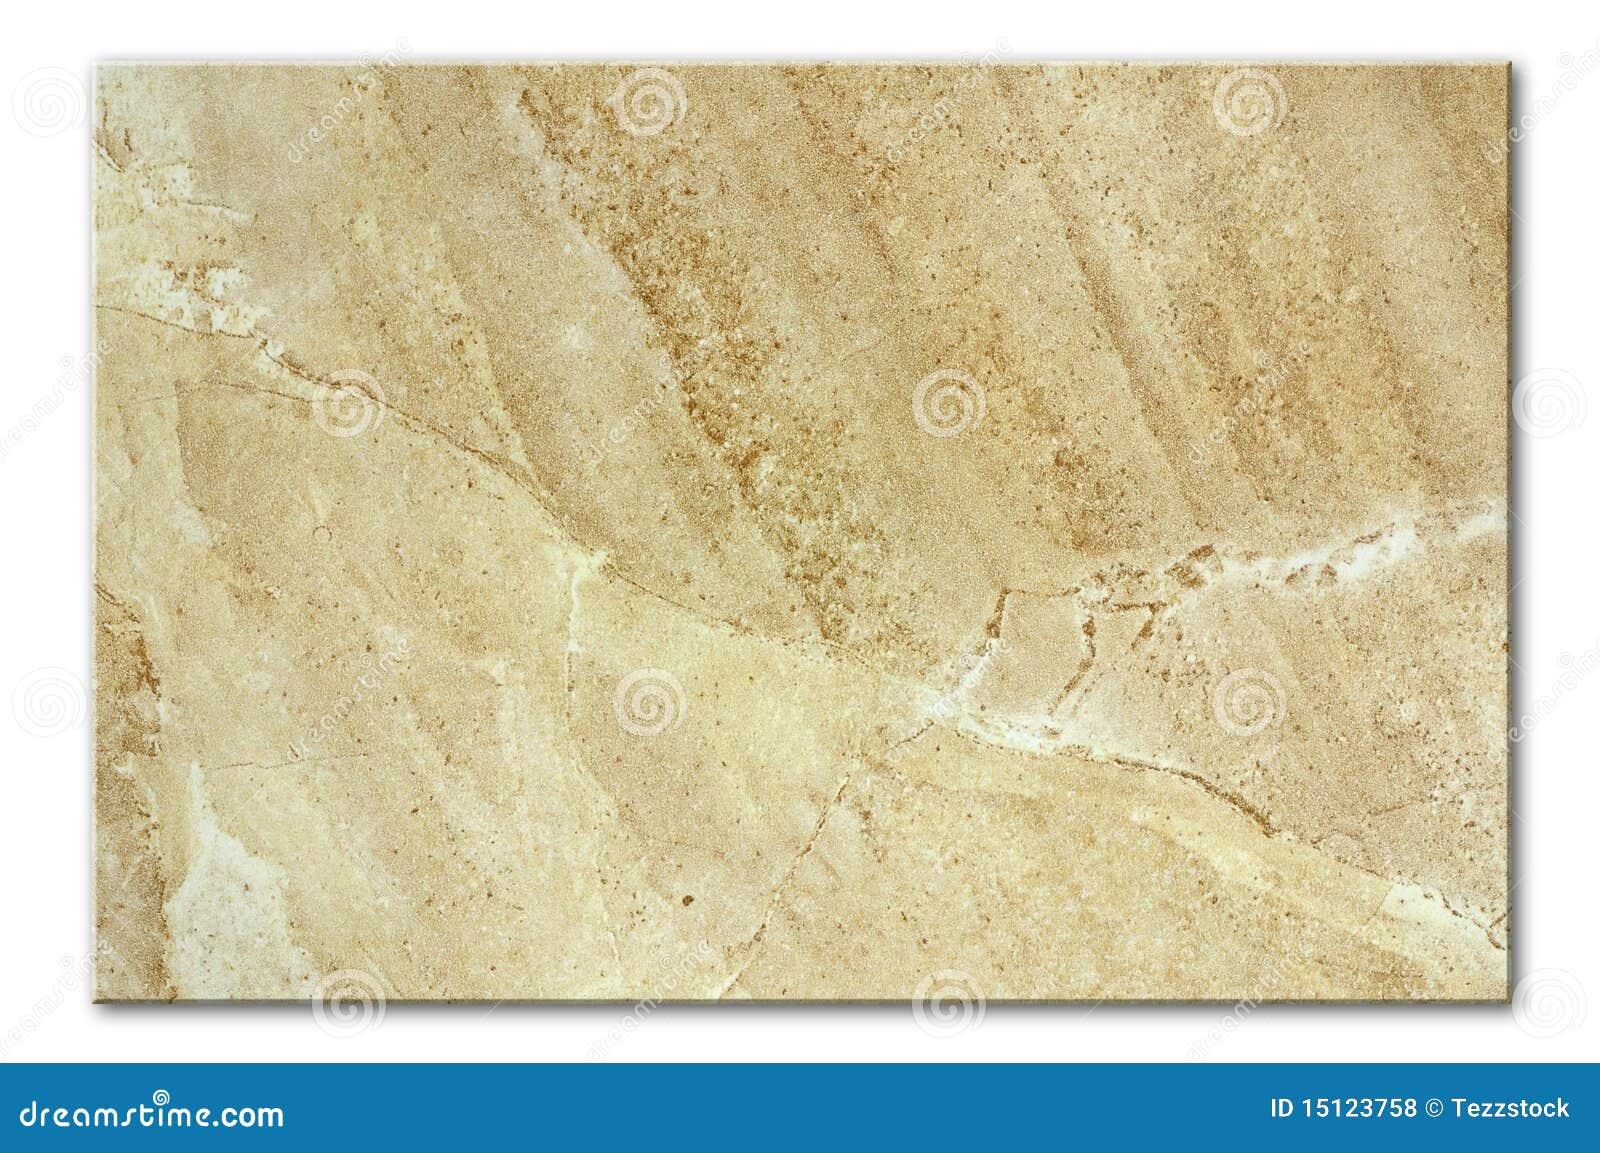 Carrelage de marbre photos libres de droits image 15123758 for Carrelage de marbre